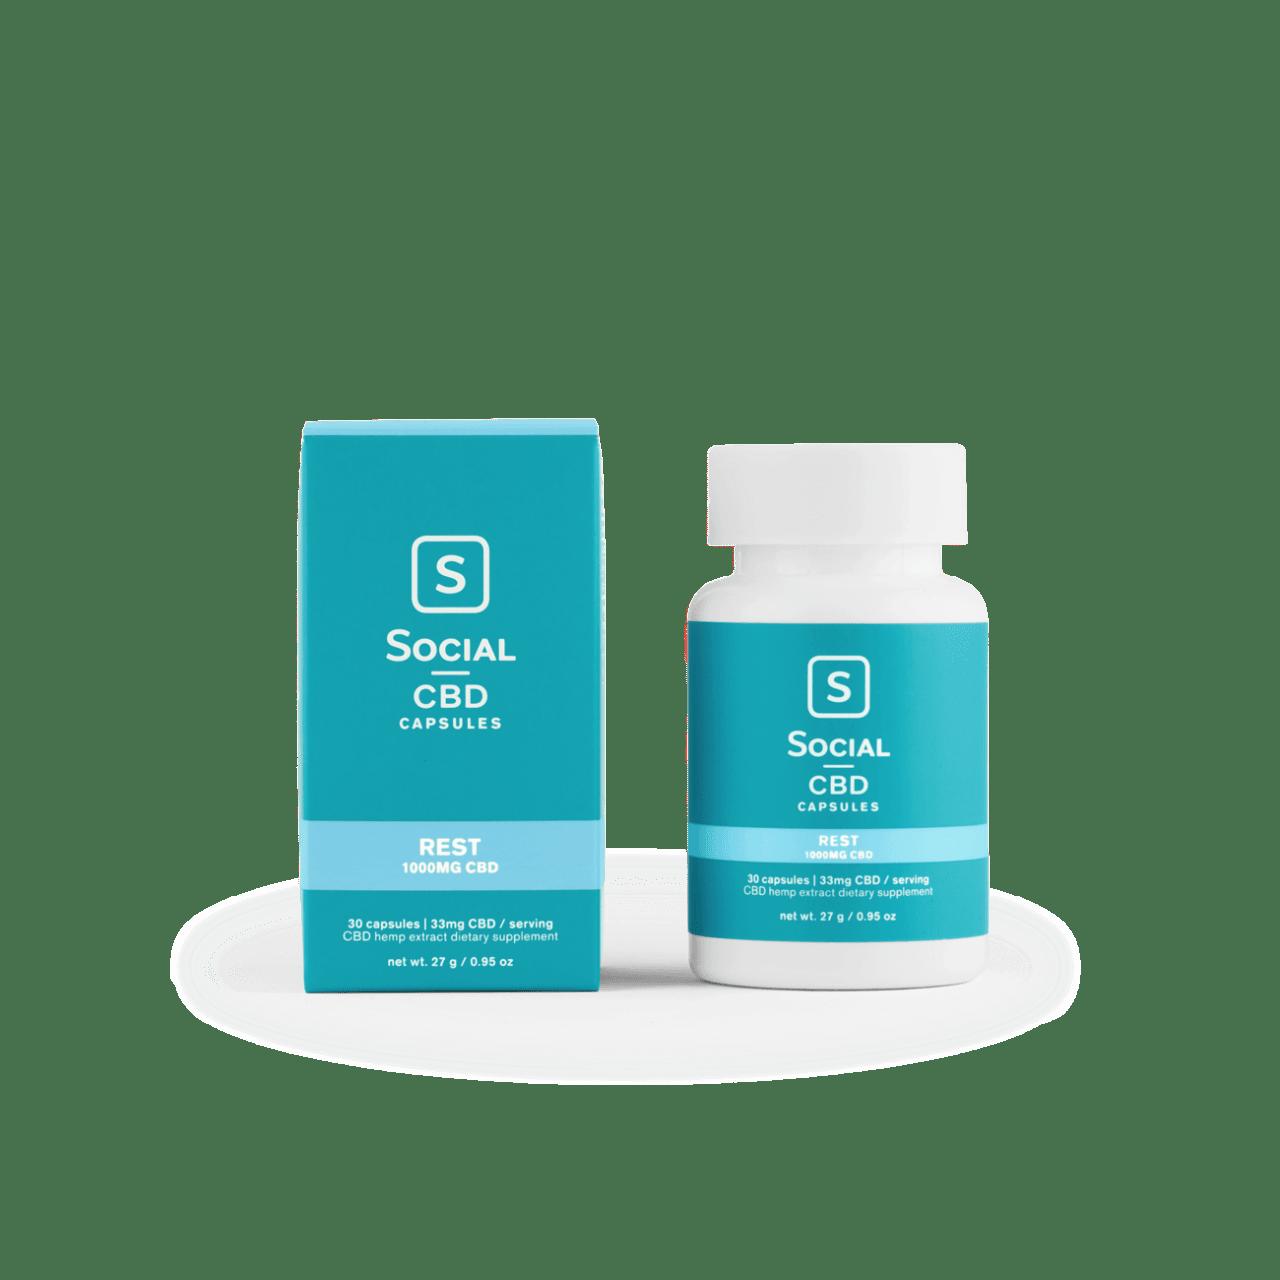 Social CBD, Rest CBD Gel Capsules, Isolate THC-Free, 30ct, 1000 CBD 1